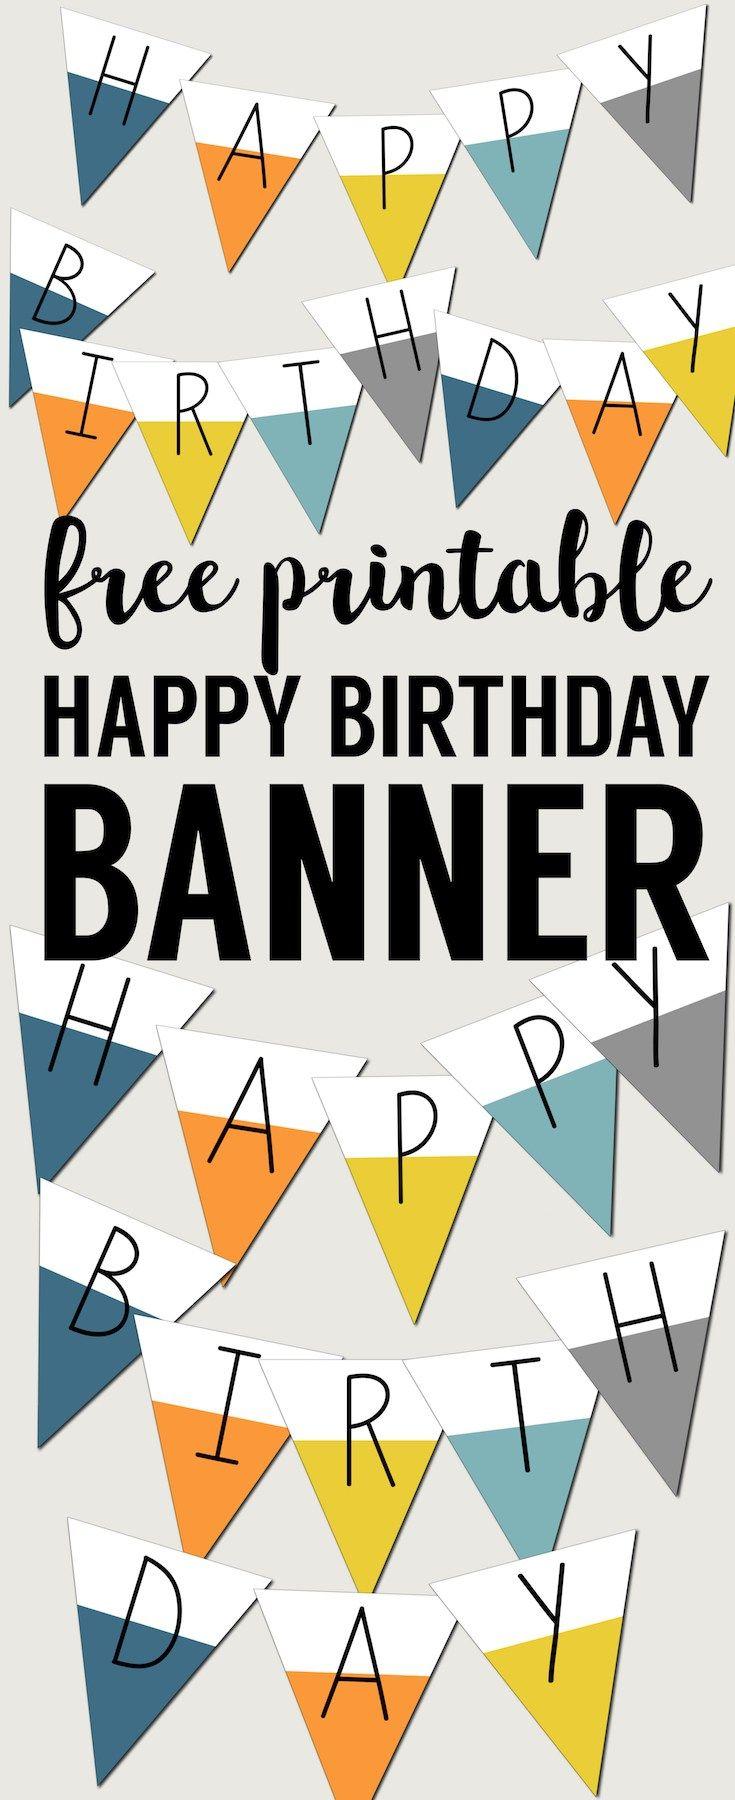 Free printable happy birthday banner happy birthday